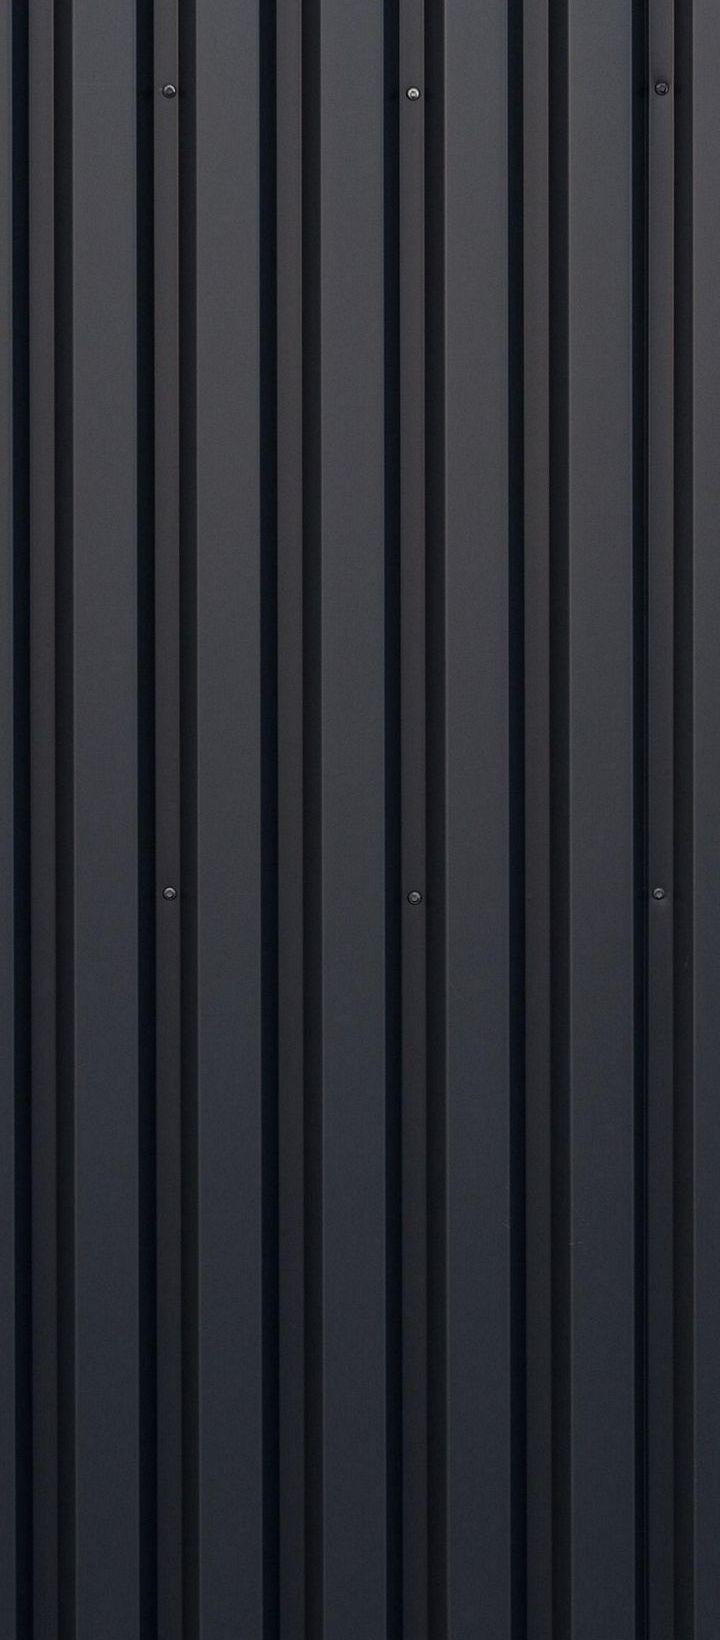 720x1640 Phone Wallpaper 335